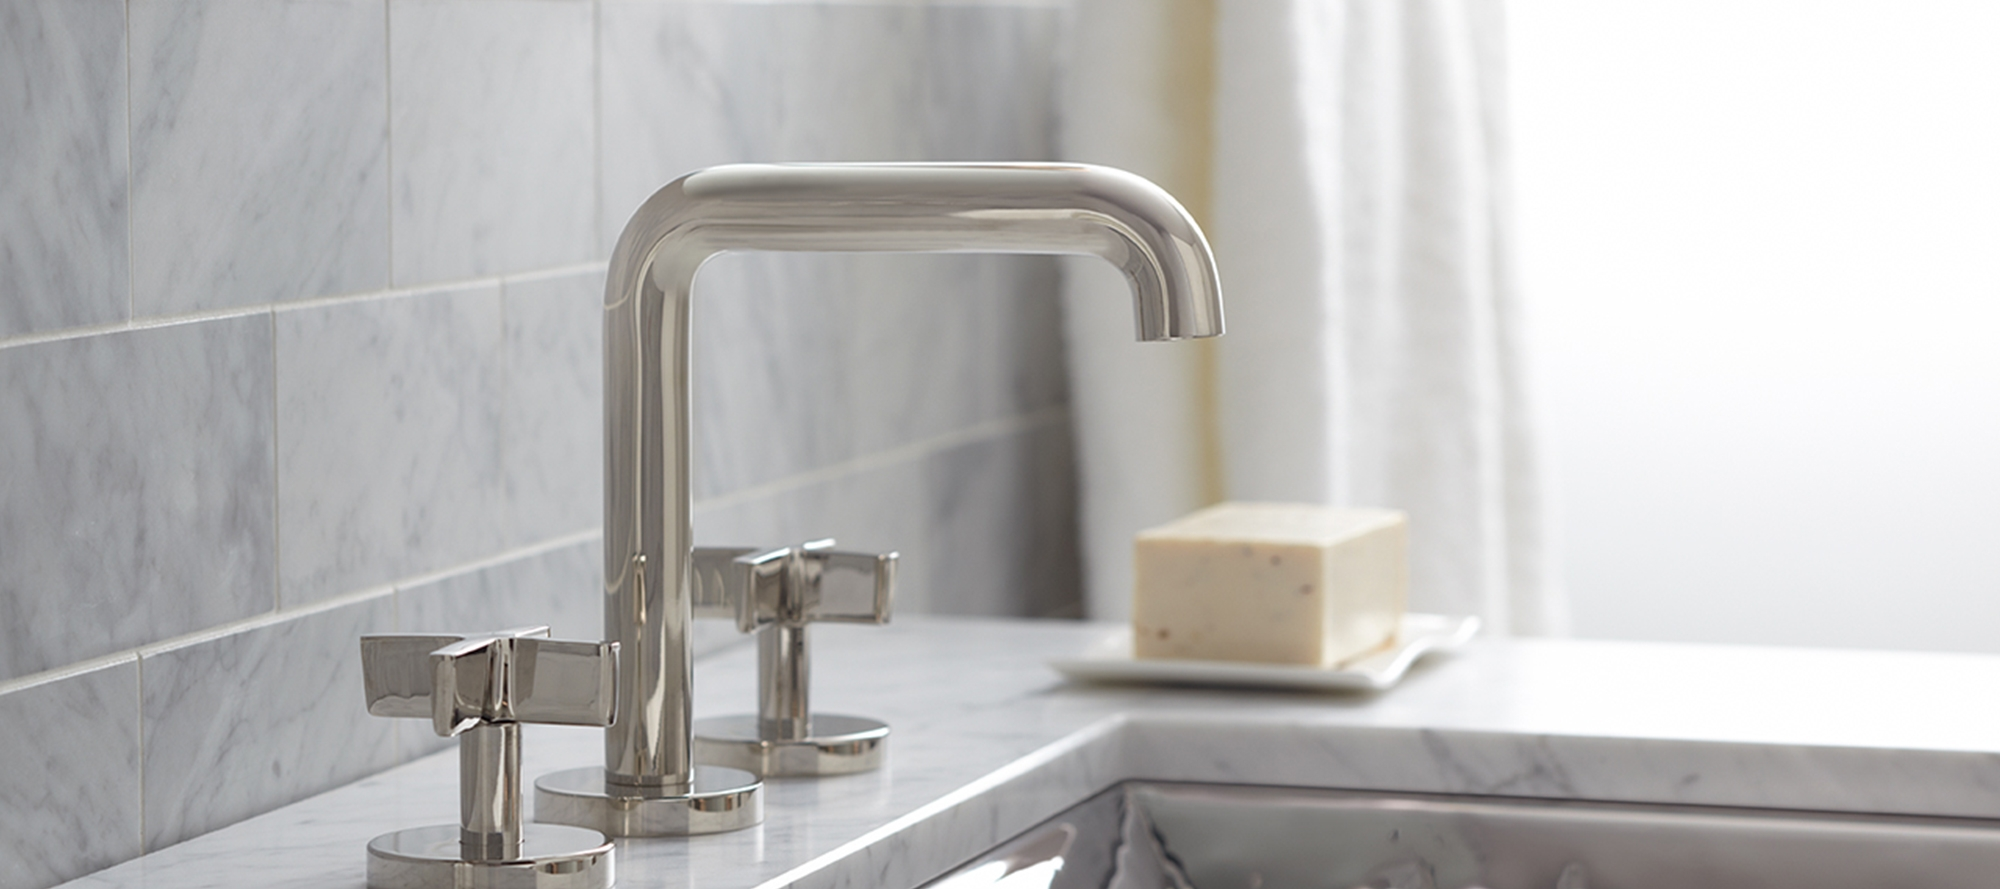 kallista one kitchen faucet kallista one kitchen faucet one sidespray p25210 00 kitchen accessories kallista kallista 2000 x 889